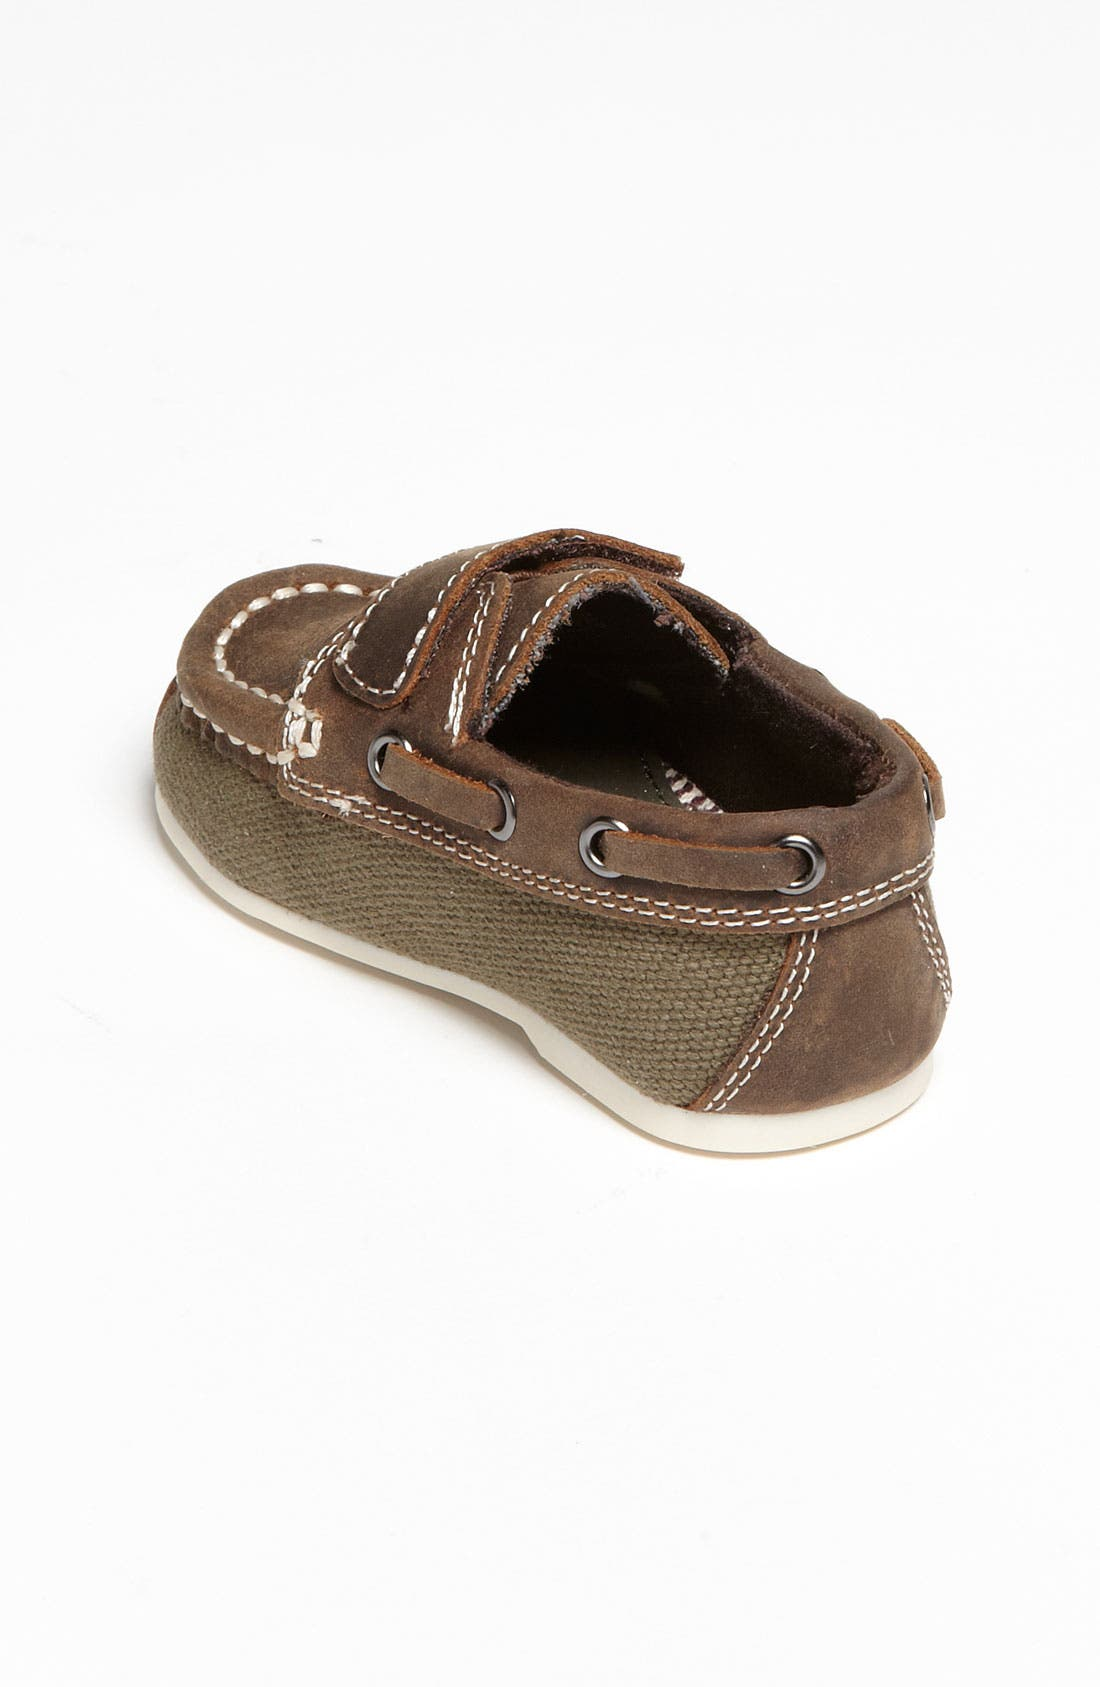 Alternate Image 2  - Cole Haan 'Mini Sail' Boat Shoe (Baby)